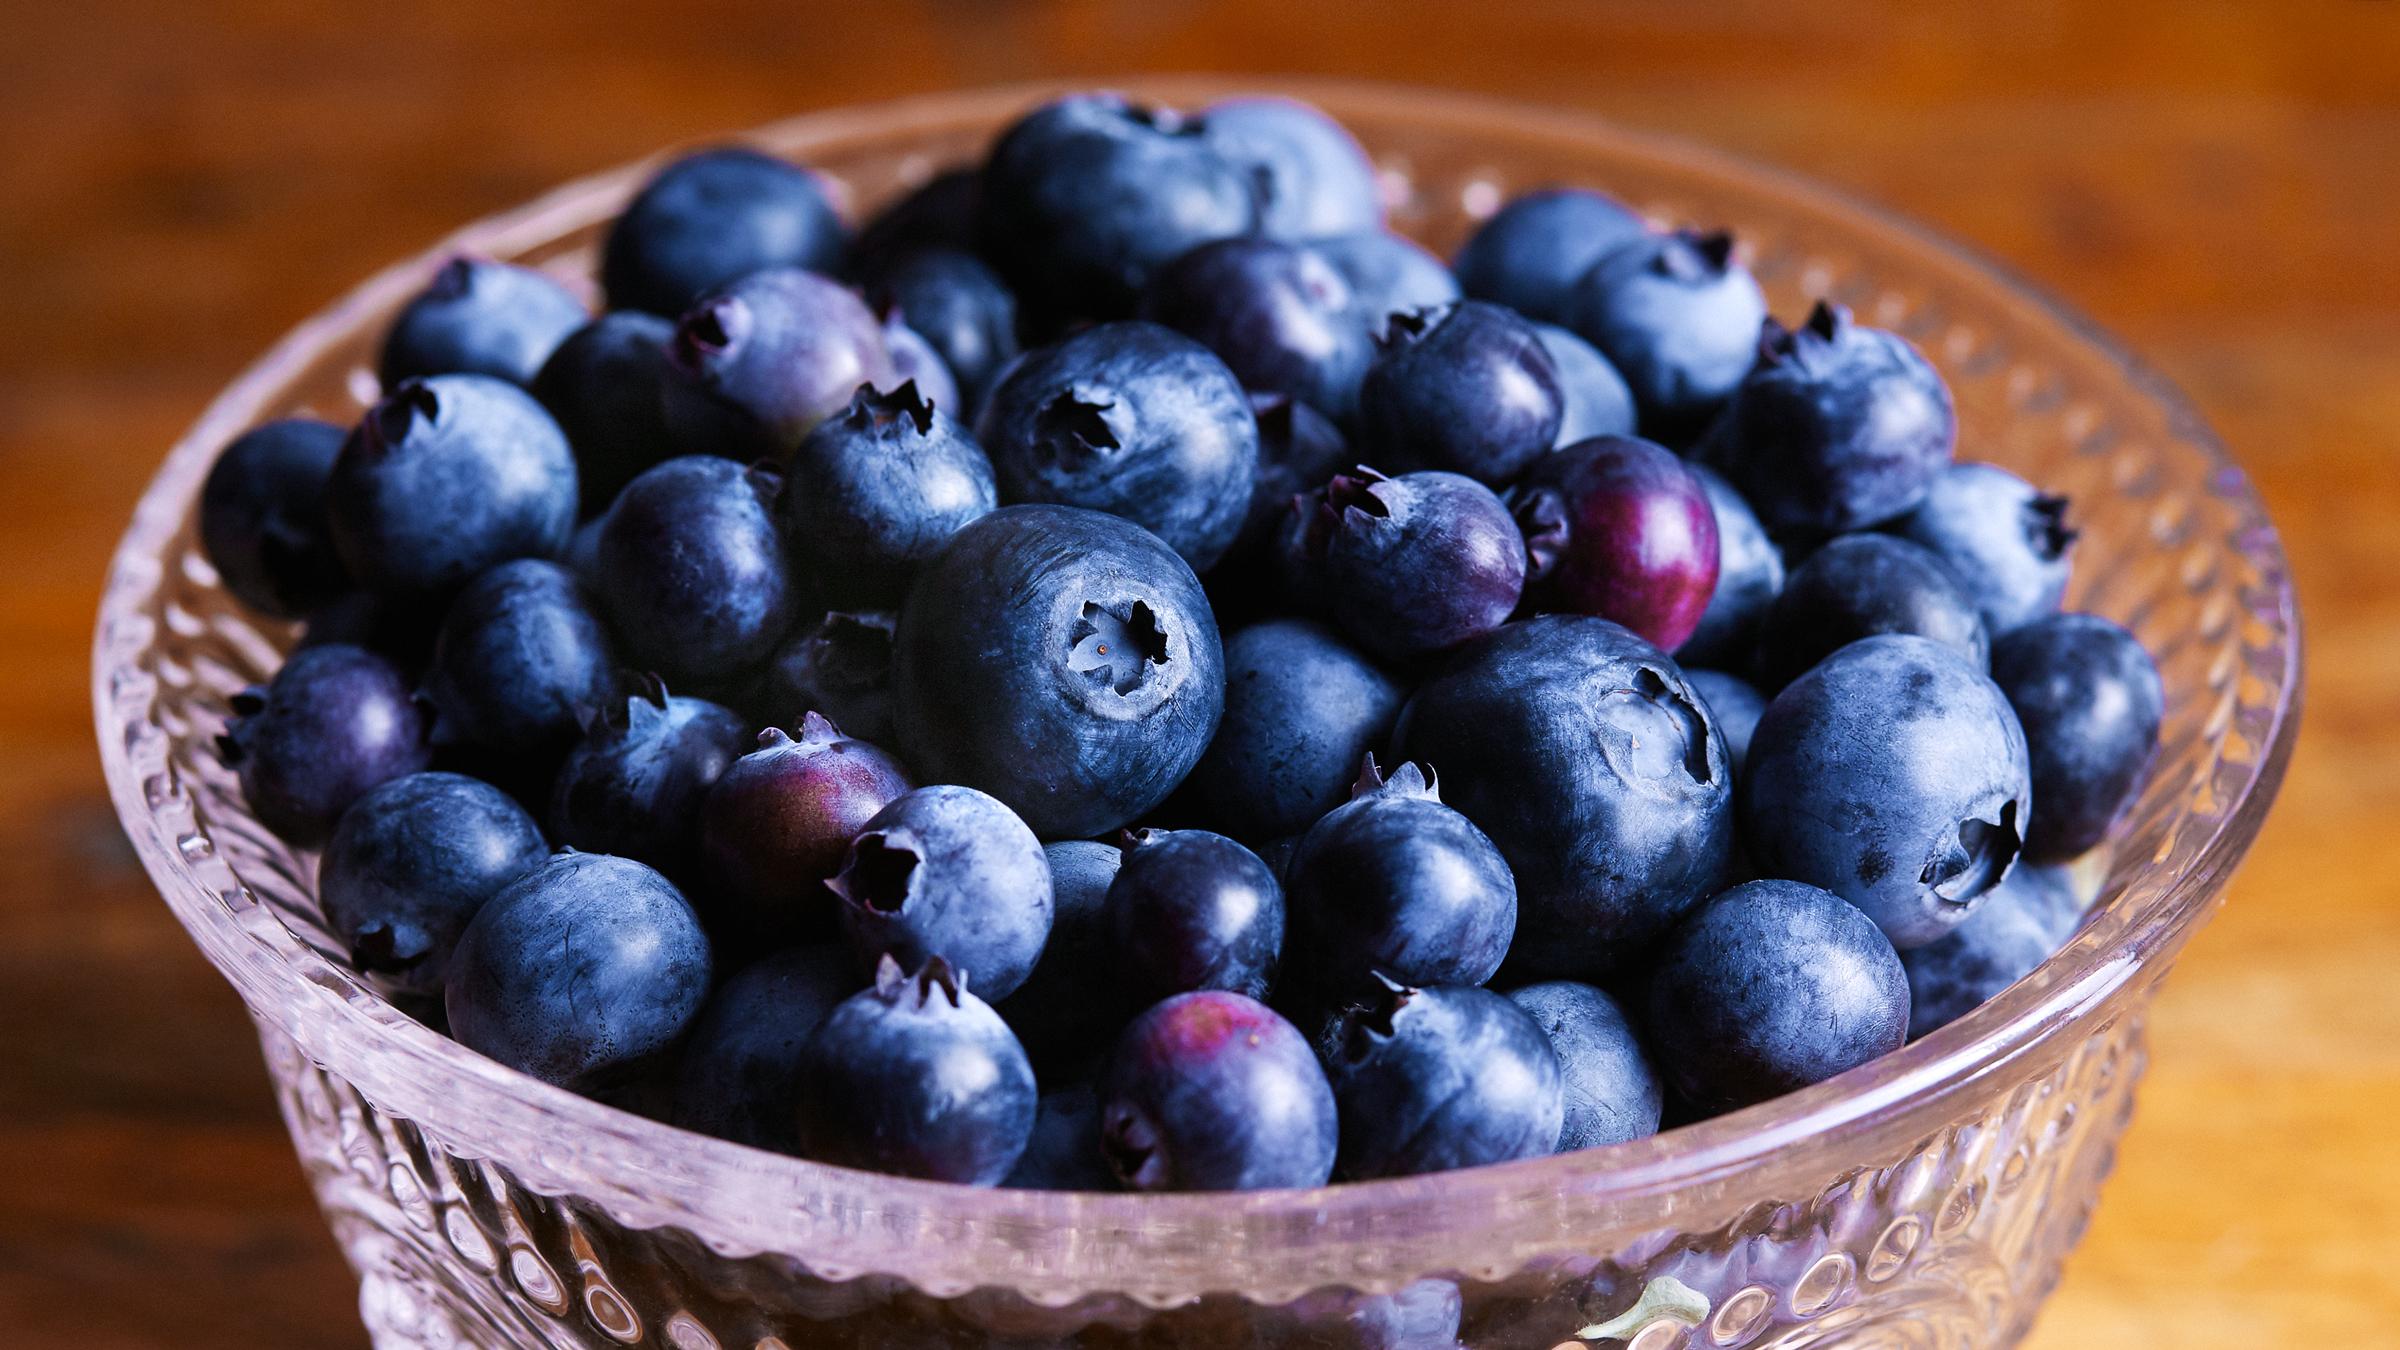 deepi_ahluwalia_walmart_blueberries_crop.jpg